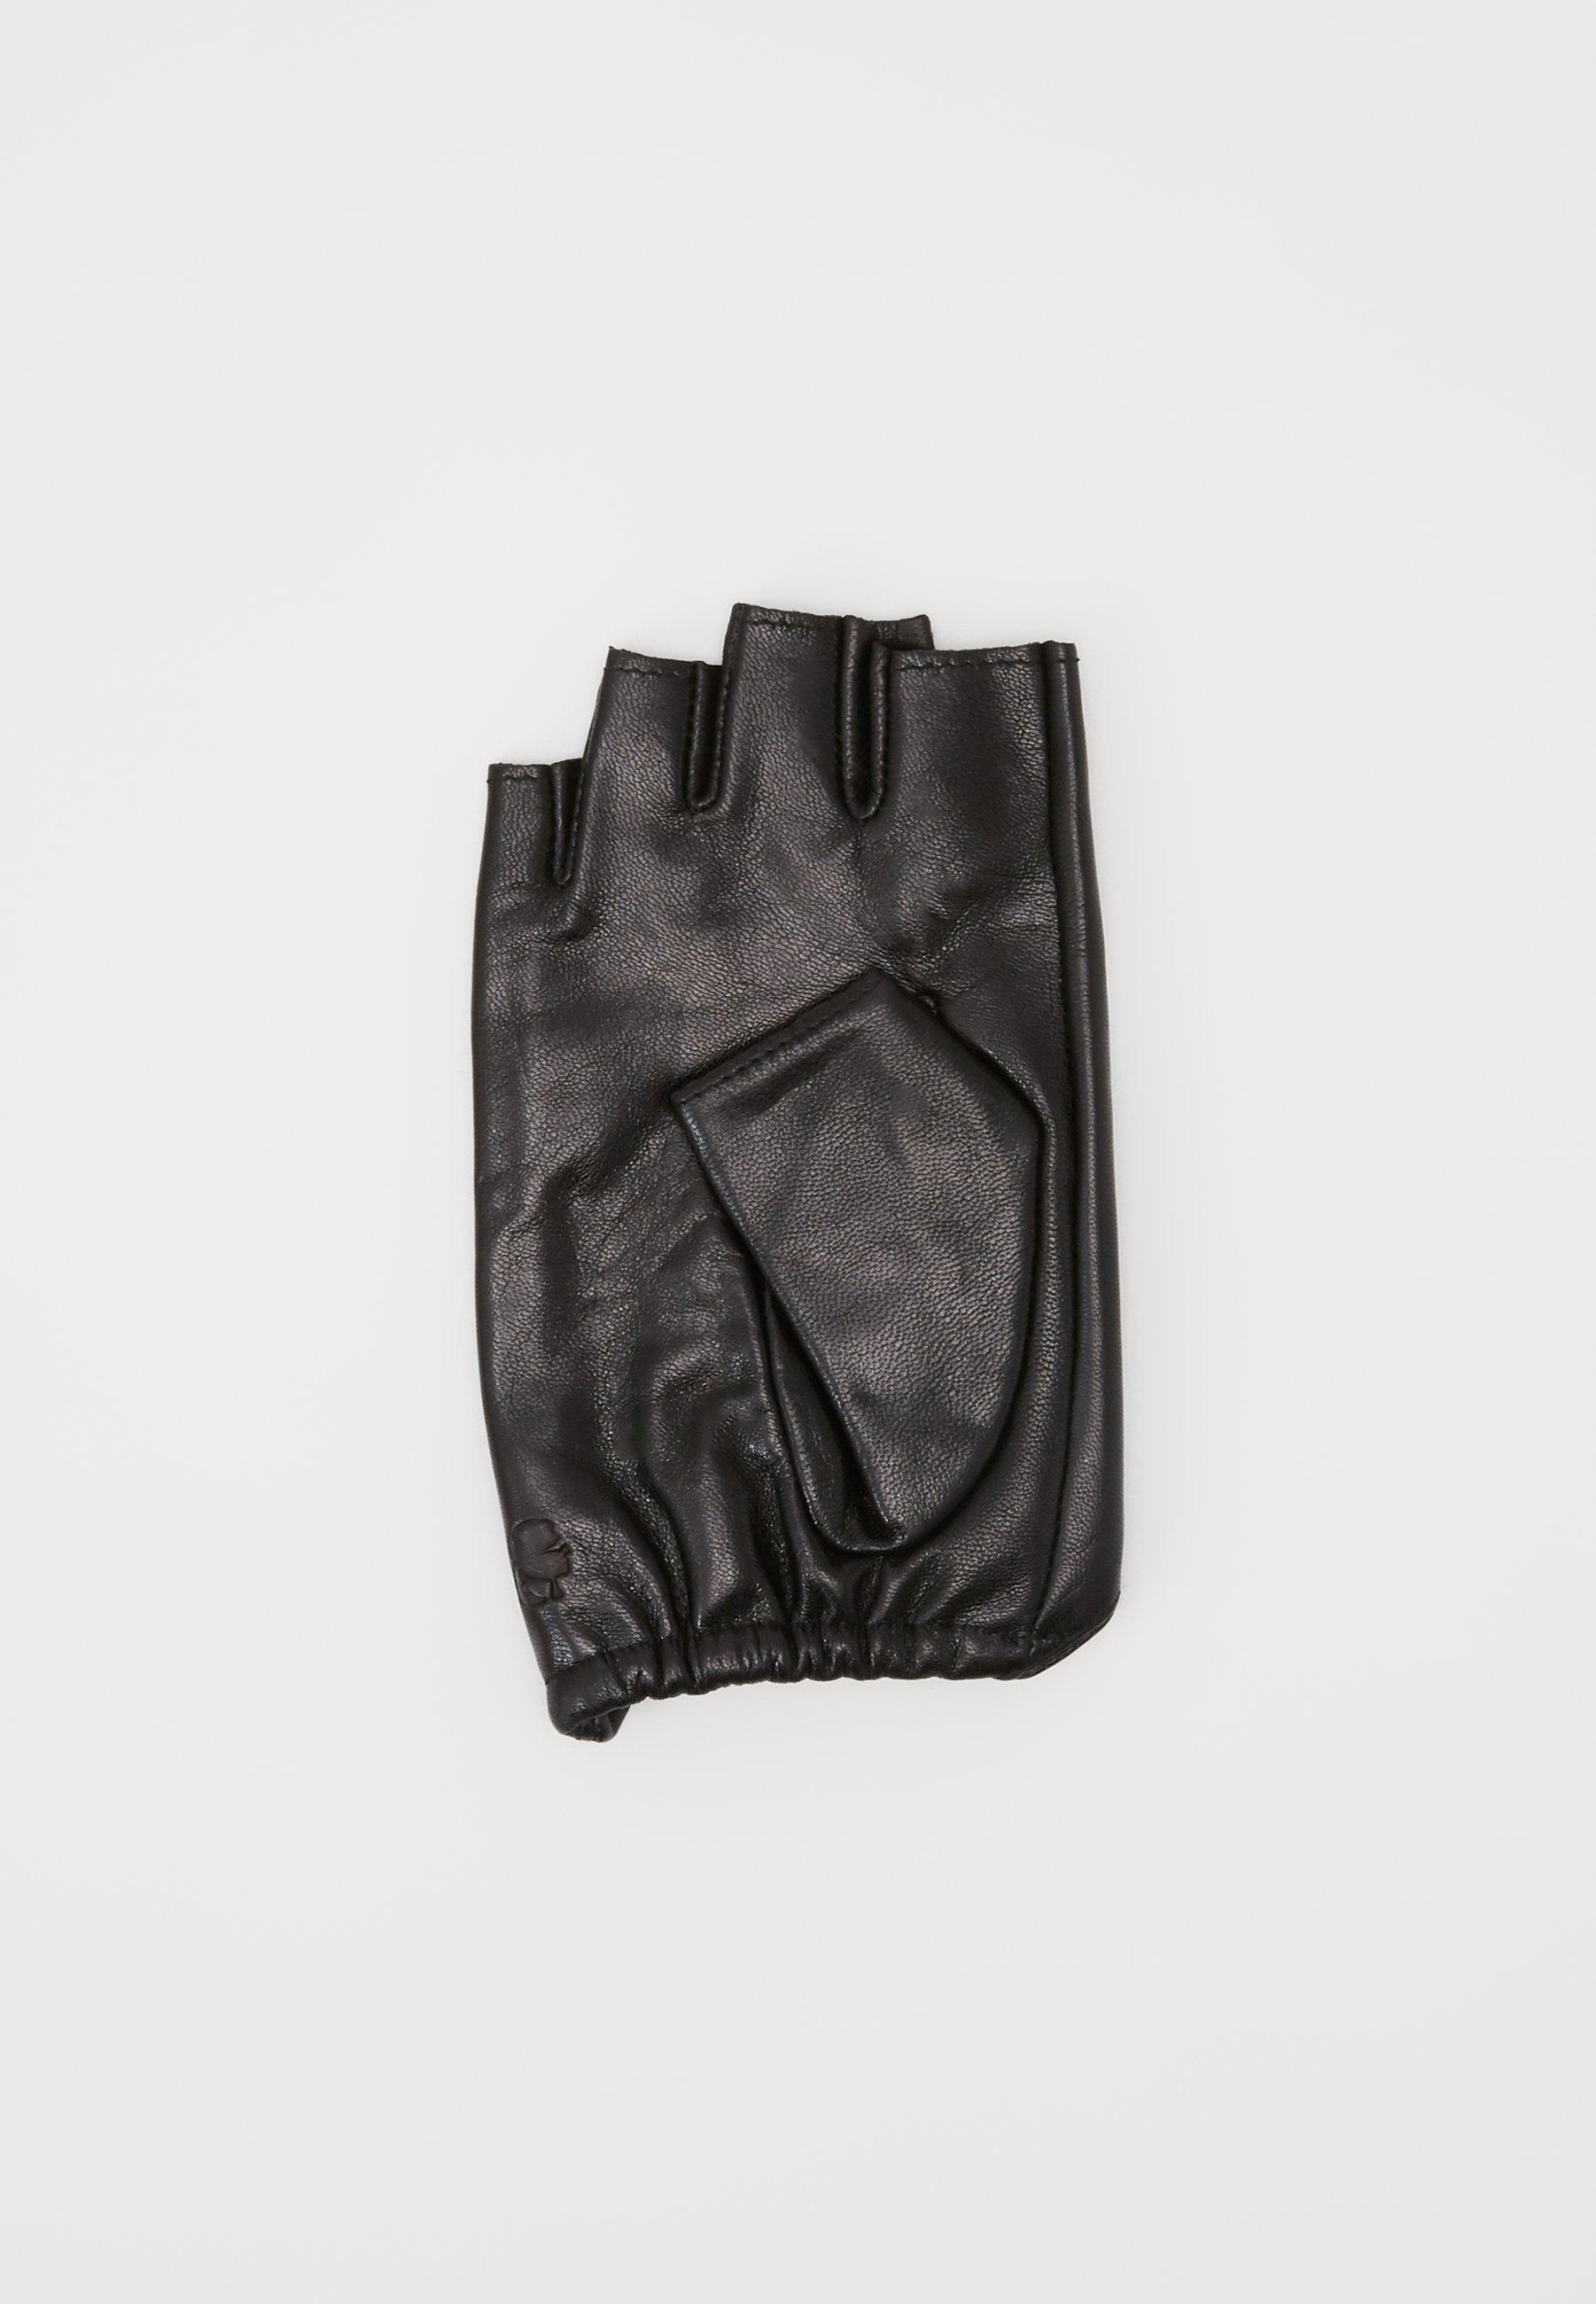 Cool Good Service Accessories KARL LAGERFELD IKONIK GLOVE Fingerless gloves black UOzmzeTTZ ea1BidN6V